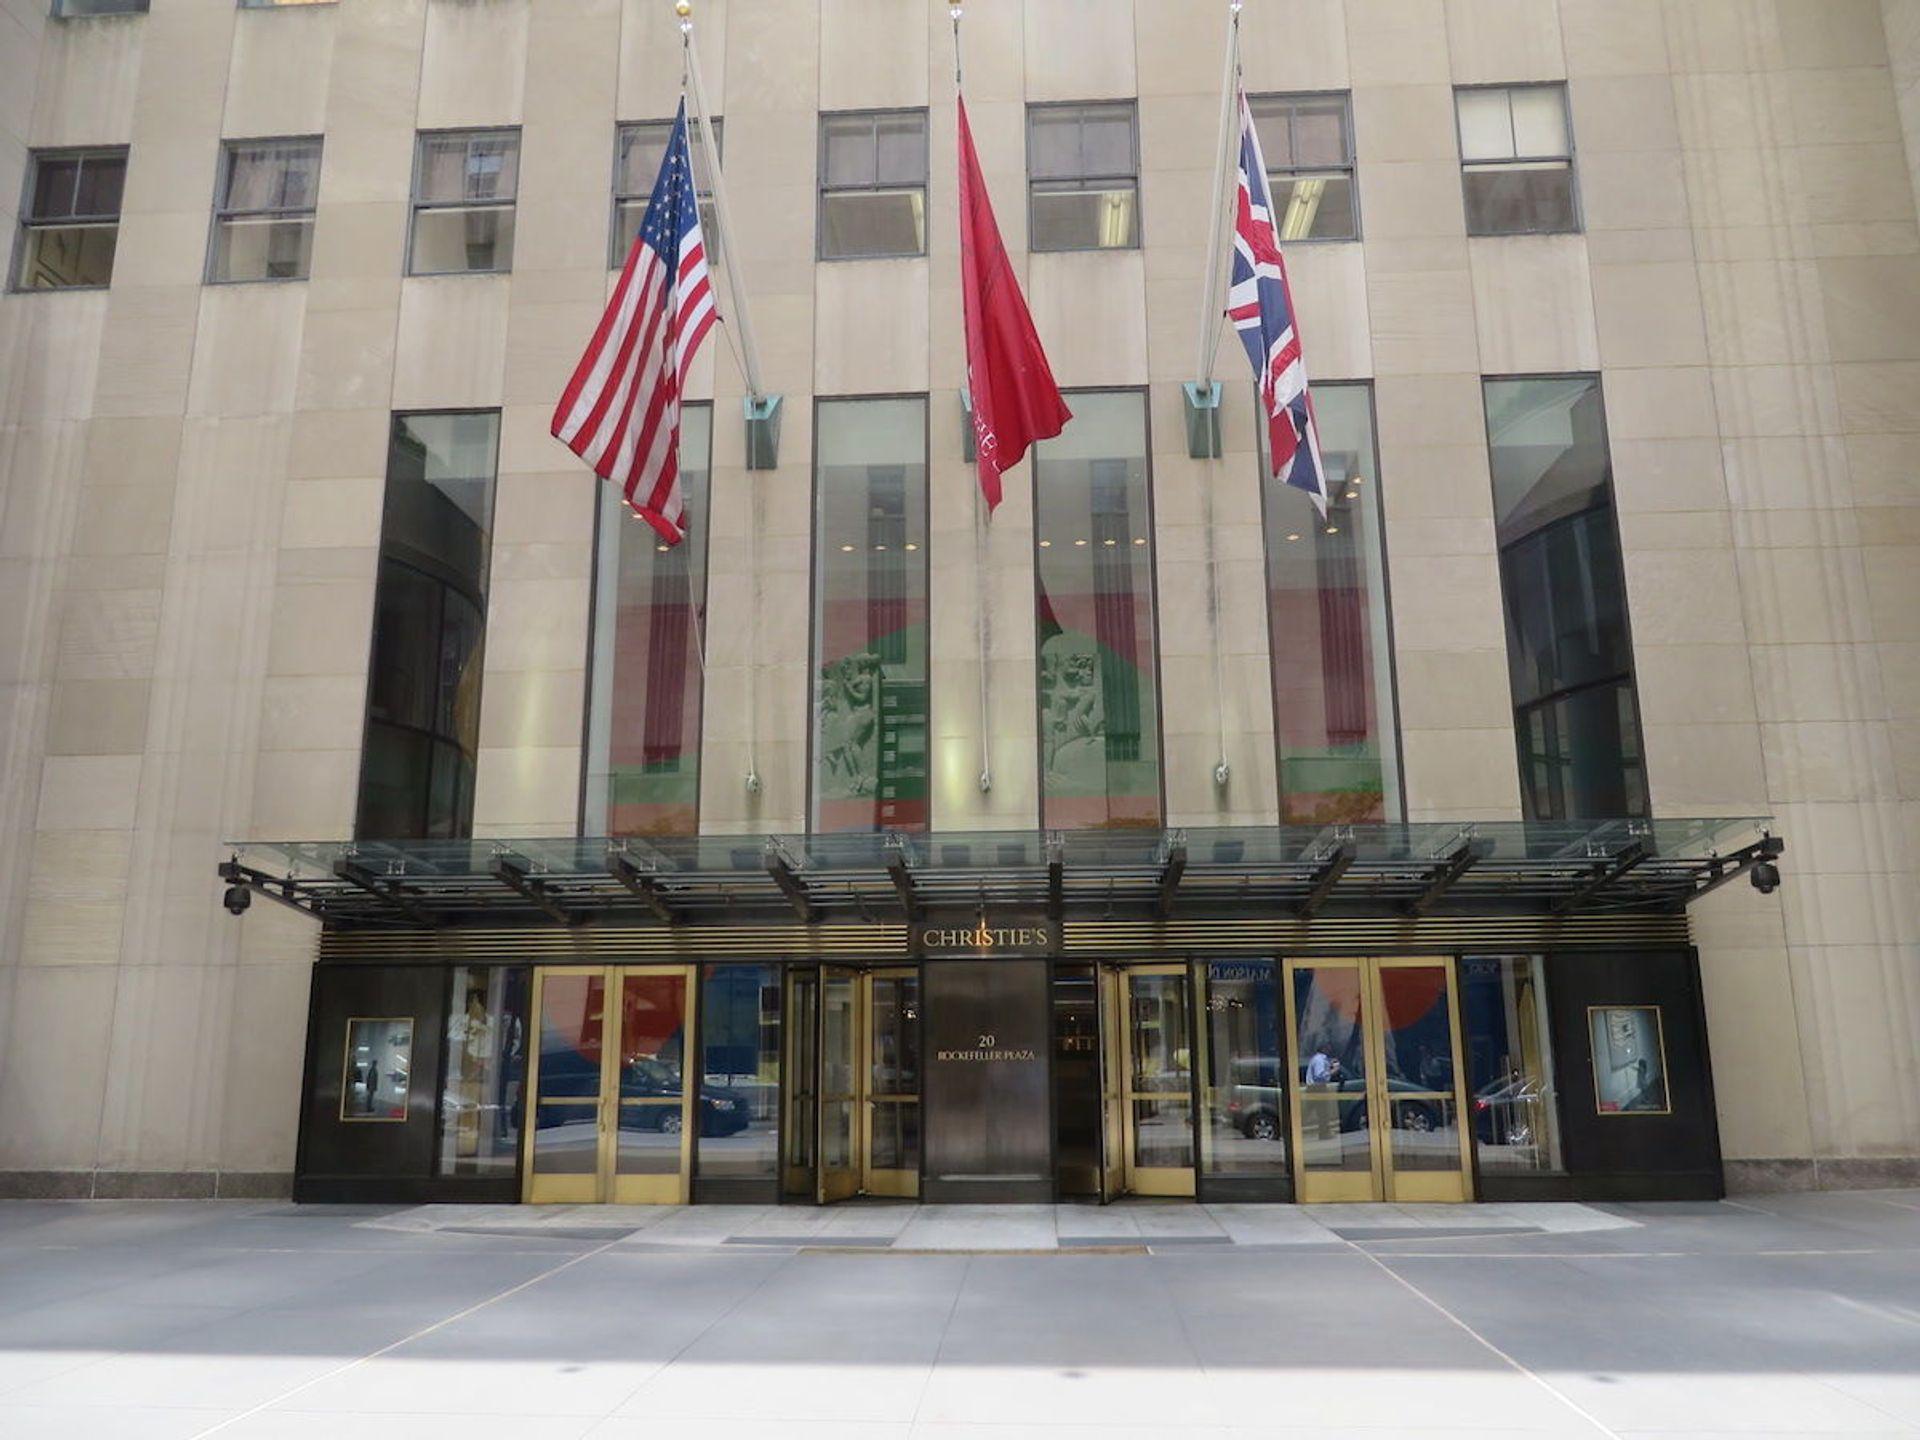 Christie's headquarters in New York's Rockefeller Plaza. Leonard J. DeFrancisci/ Wikimedia Commons